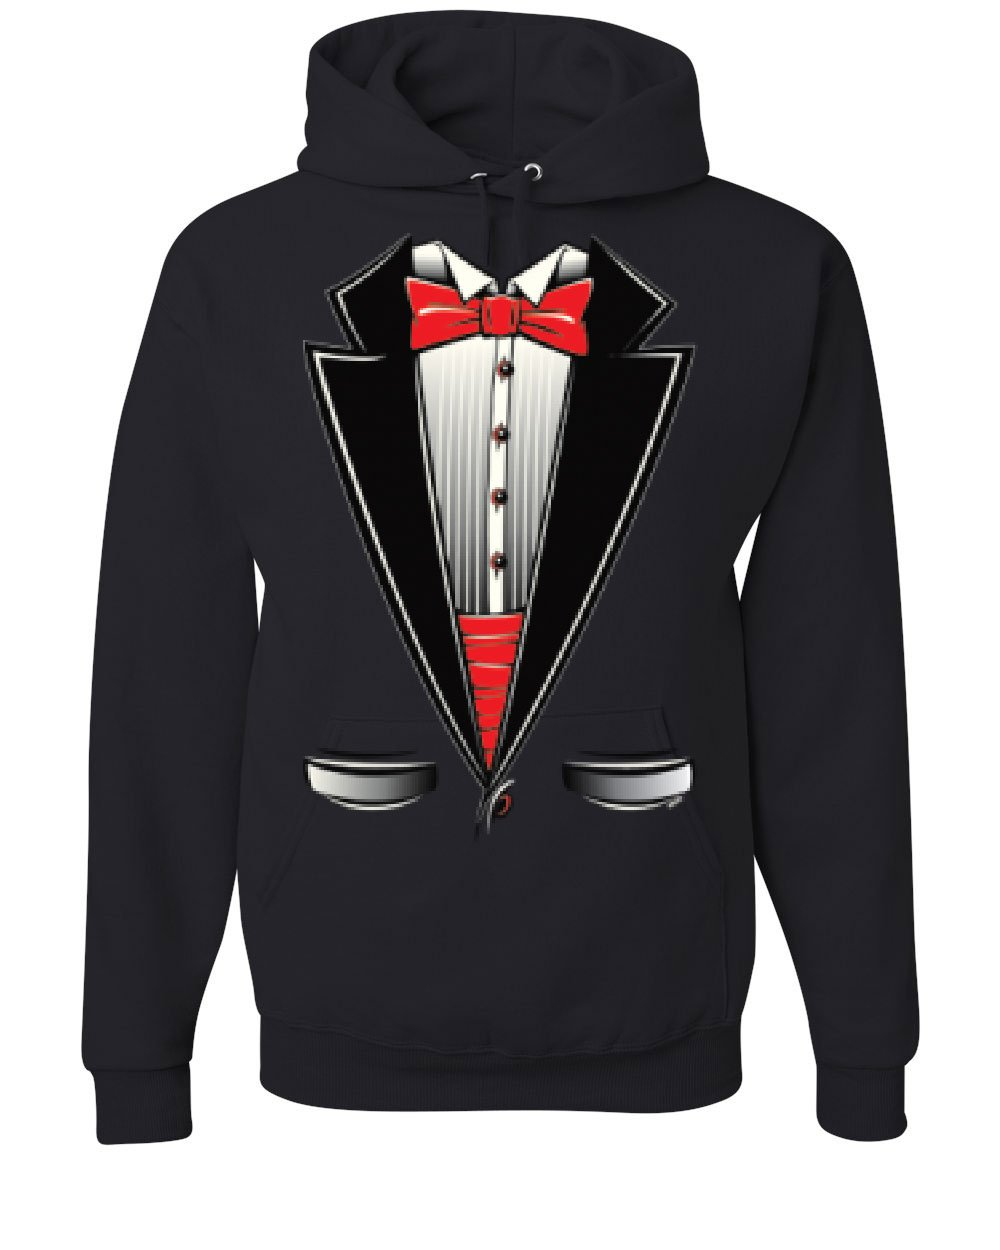 Funny Tuxedo Bow Tie Hoodie Tux Wedding Party Sweatshirt Black 4XL